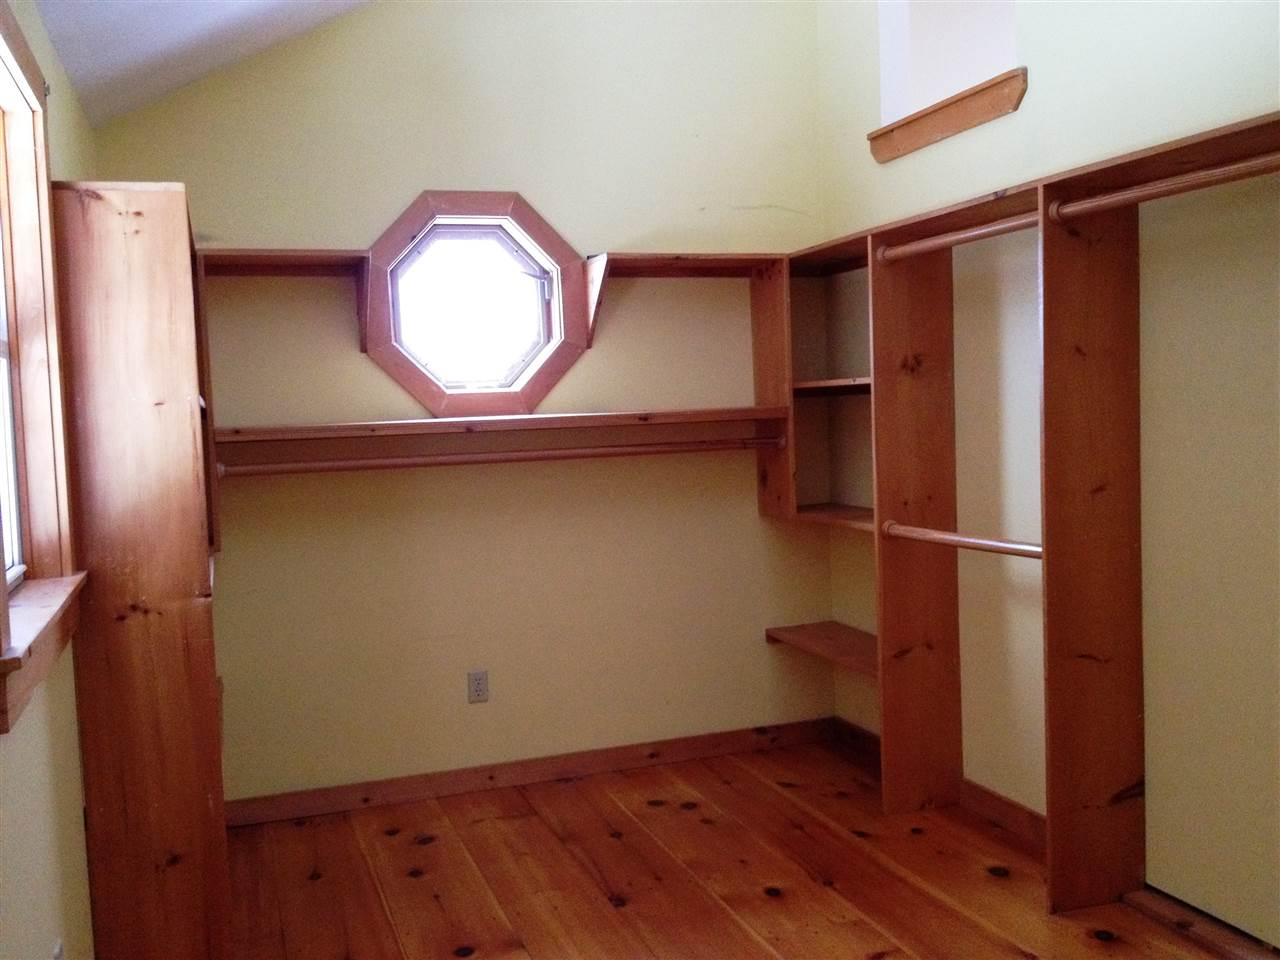 Mount-Snow-Real-Estate-4460742-17